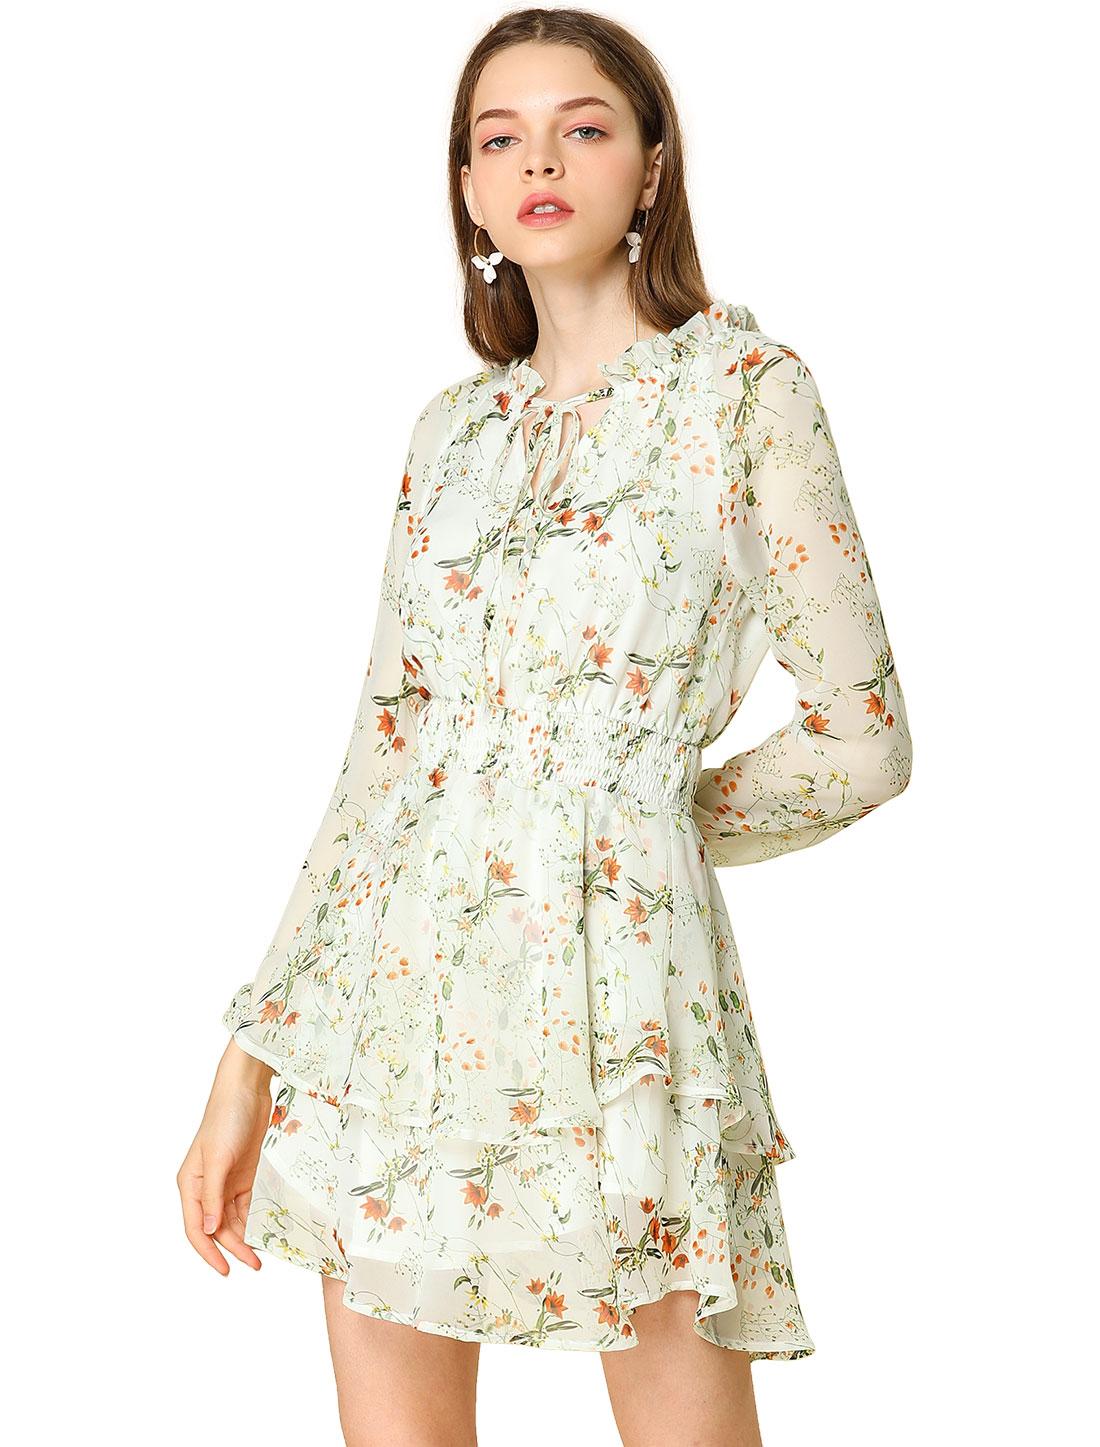 Allegra K Women's Floral Smocked Waist Chiffon Dress White M